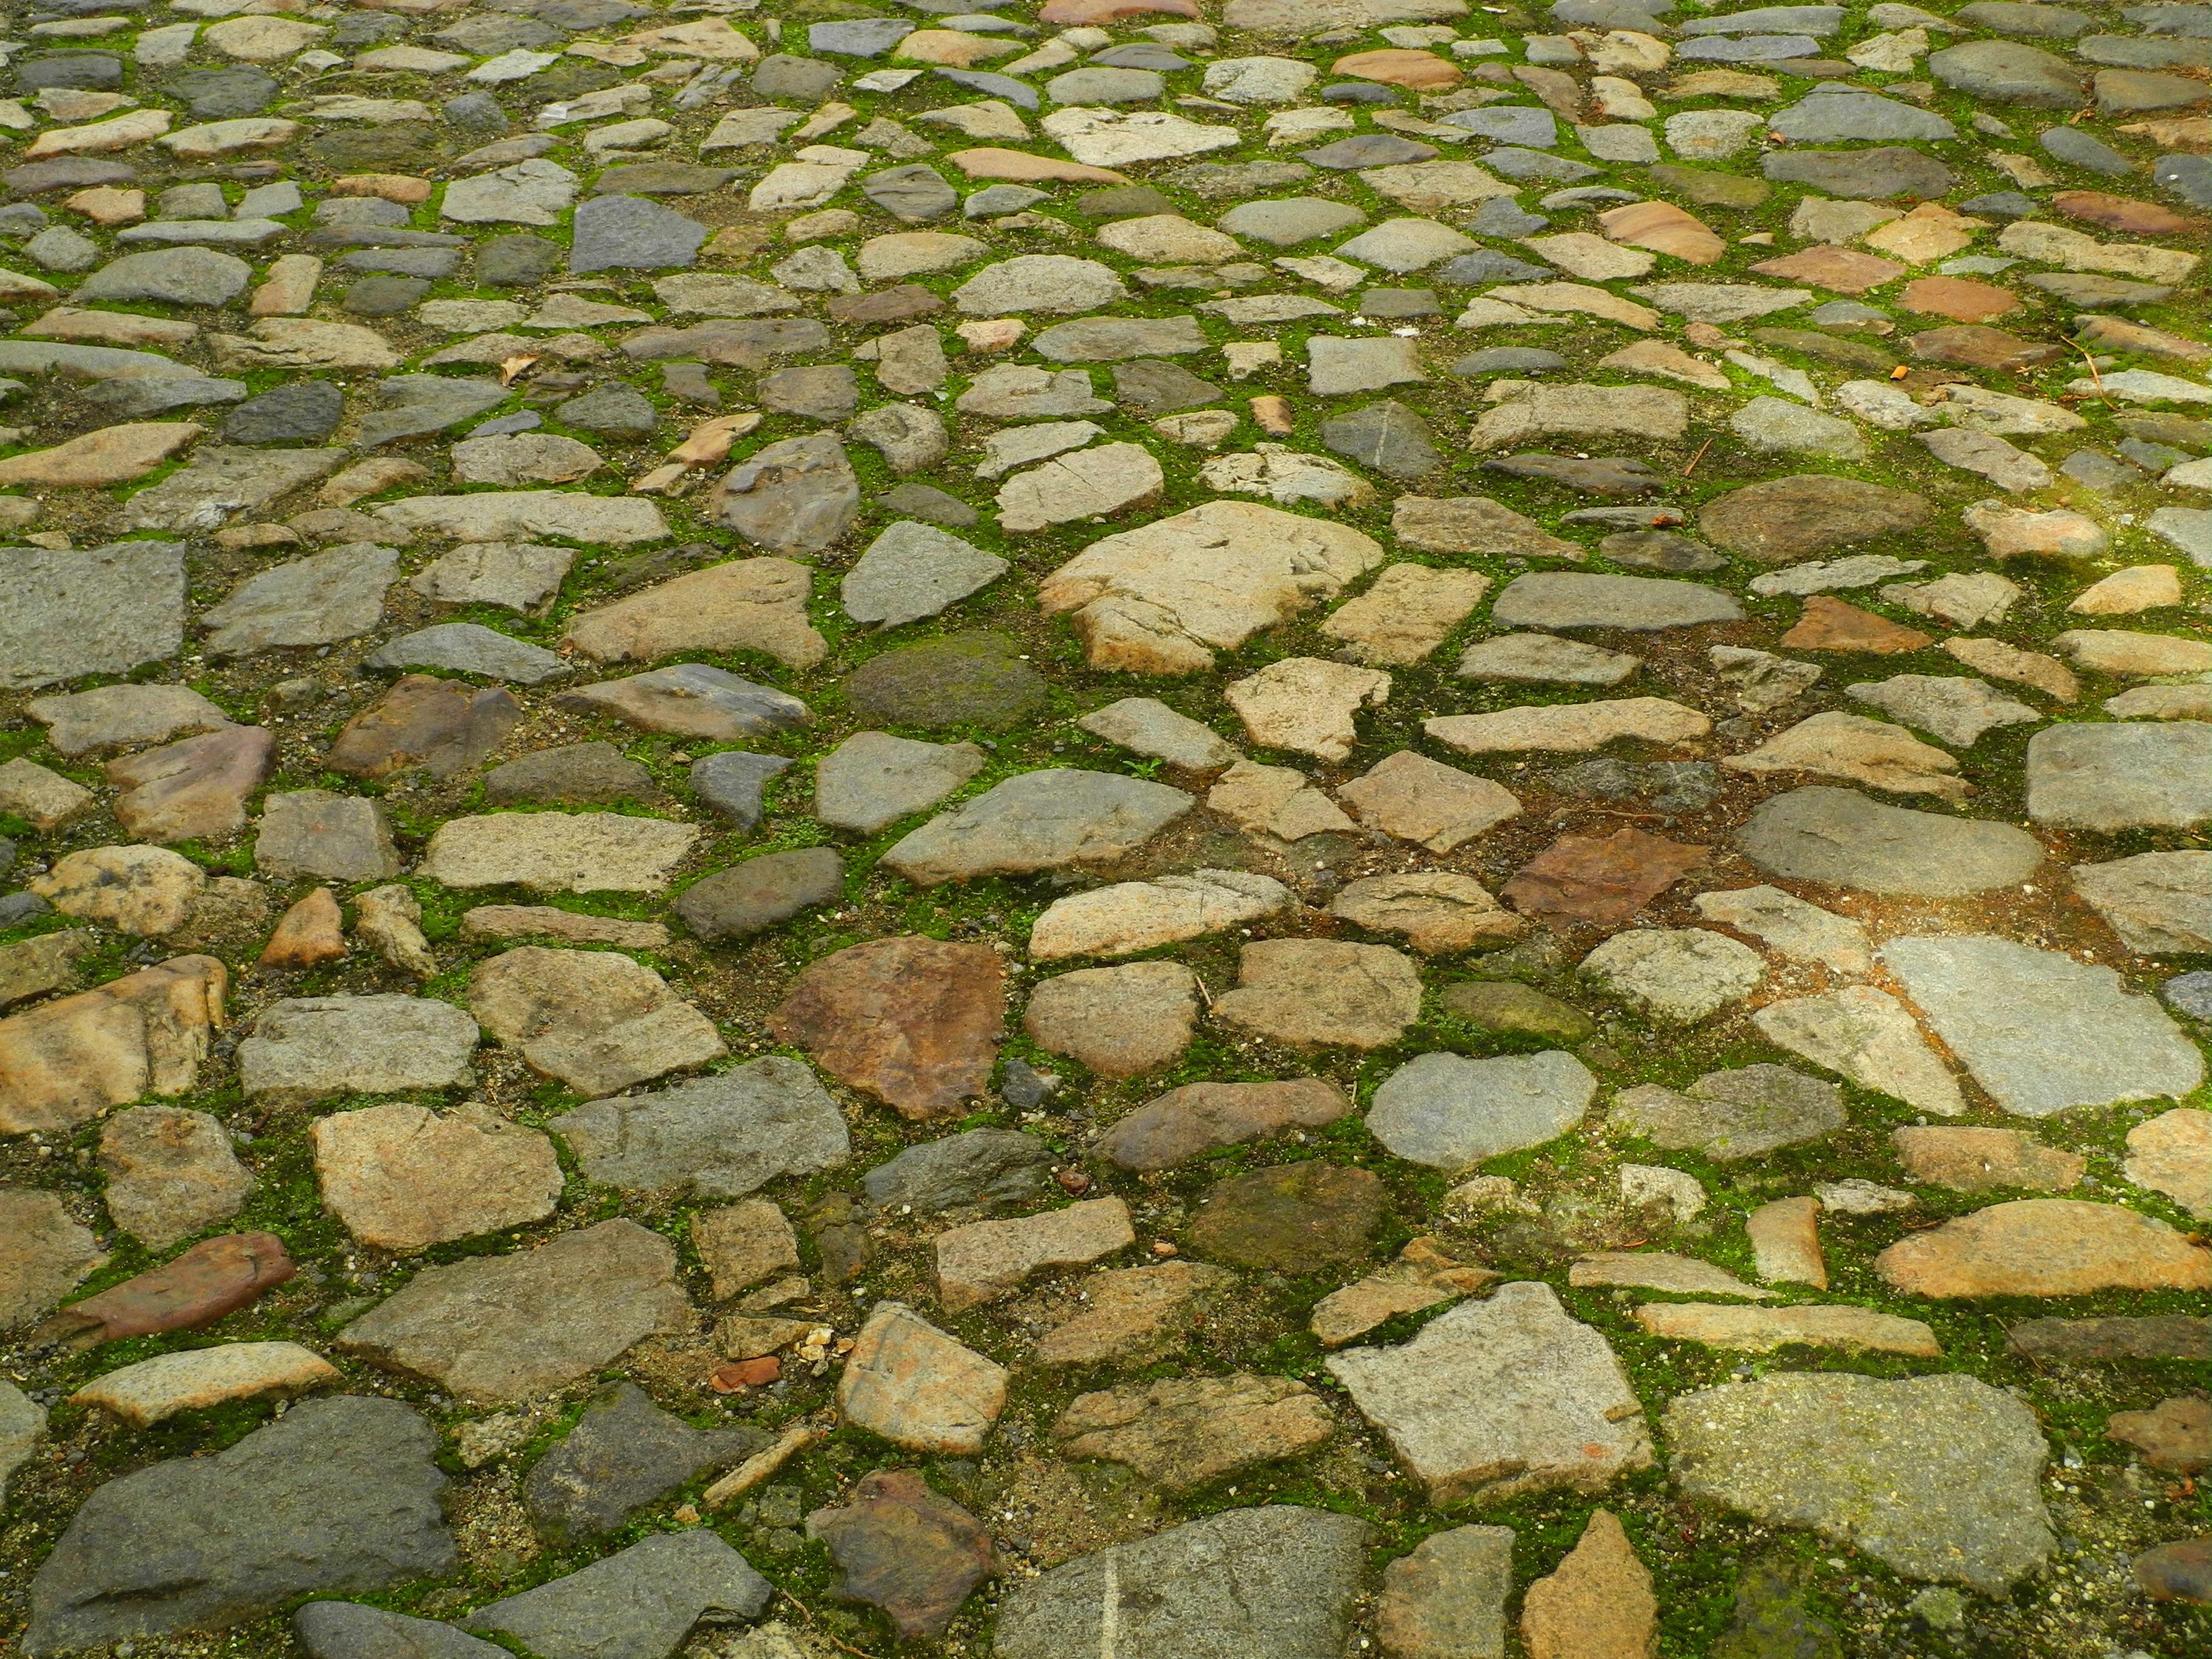 fotos gratis camino csped rock sendero piso guijarro asfalto pavimento pasarela musgo verde suelo pared de piedra piedras